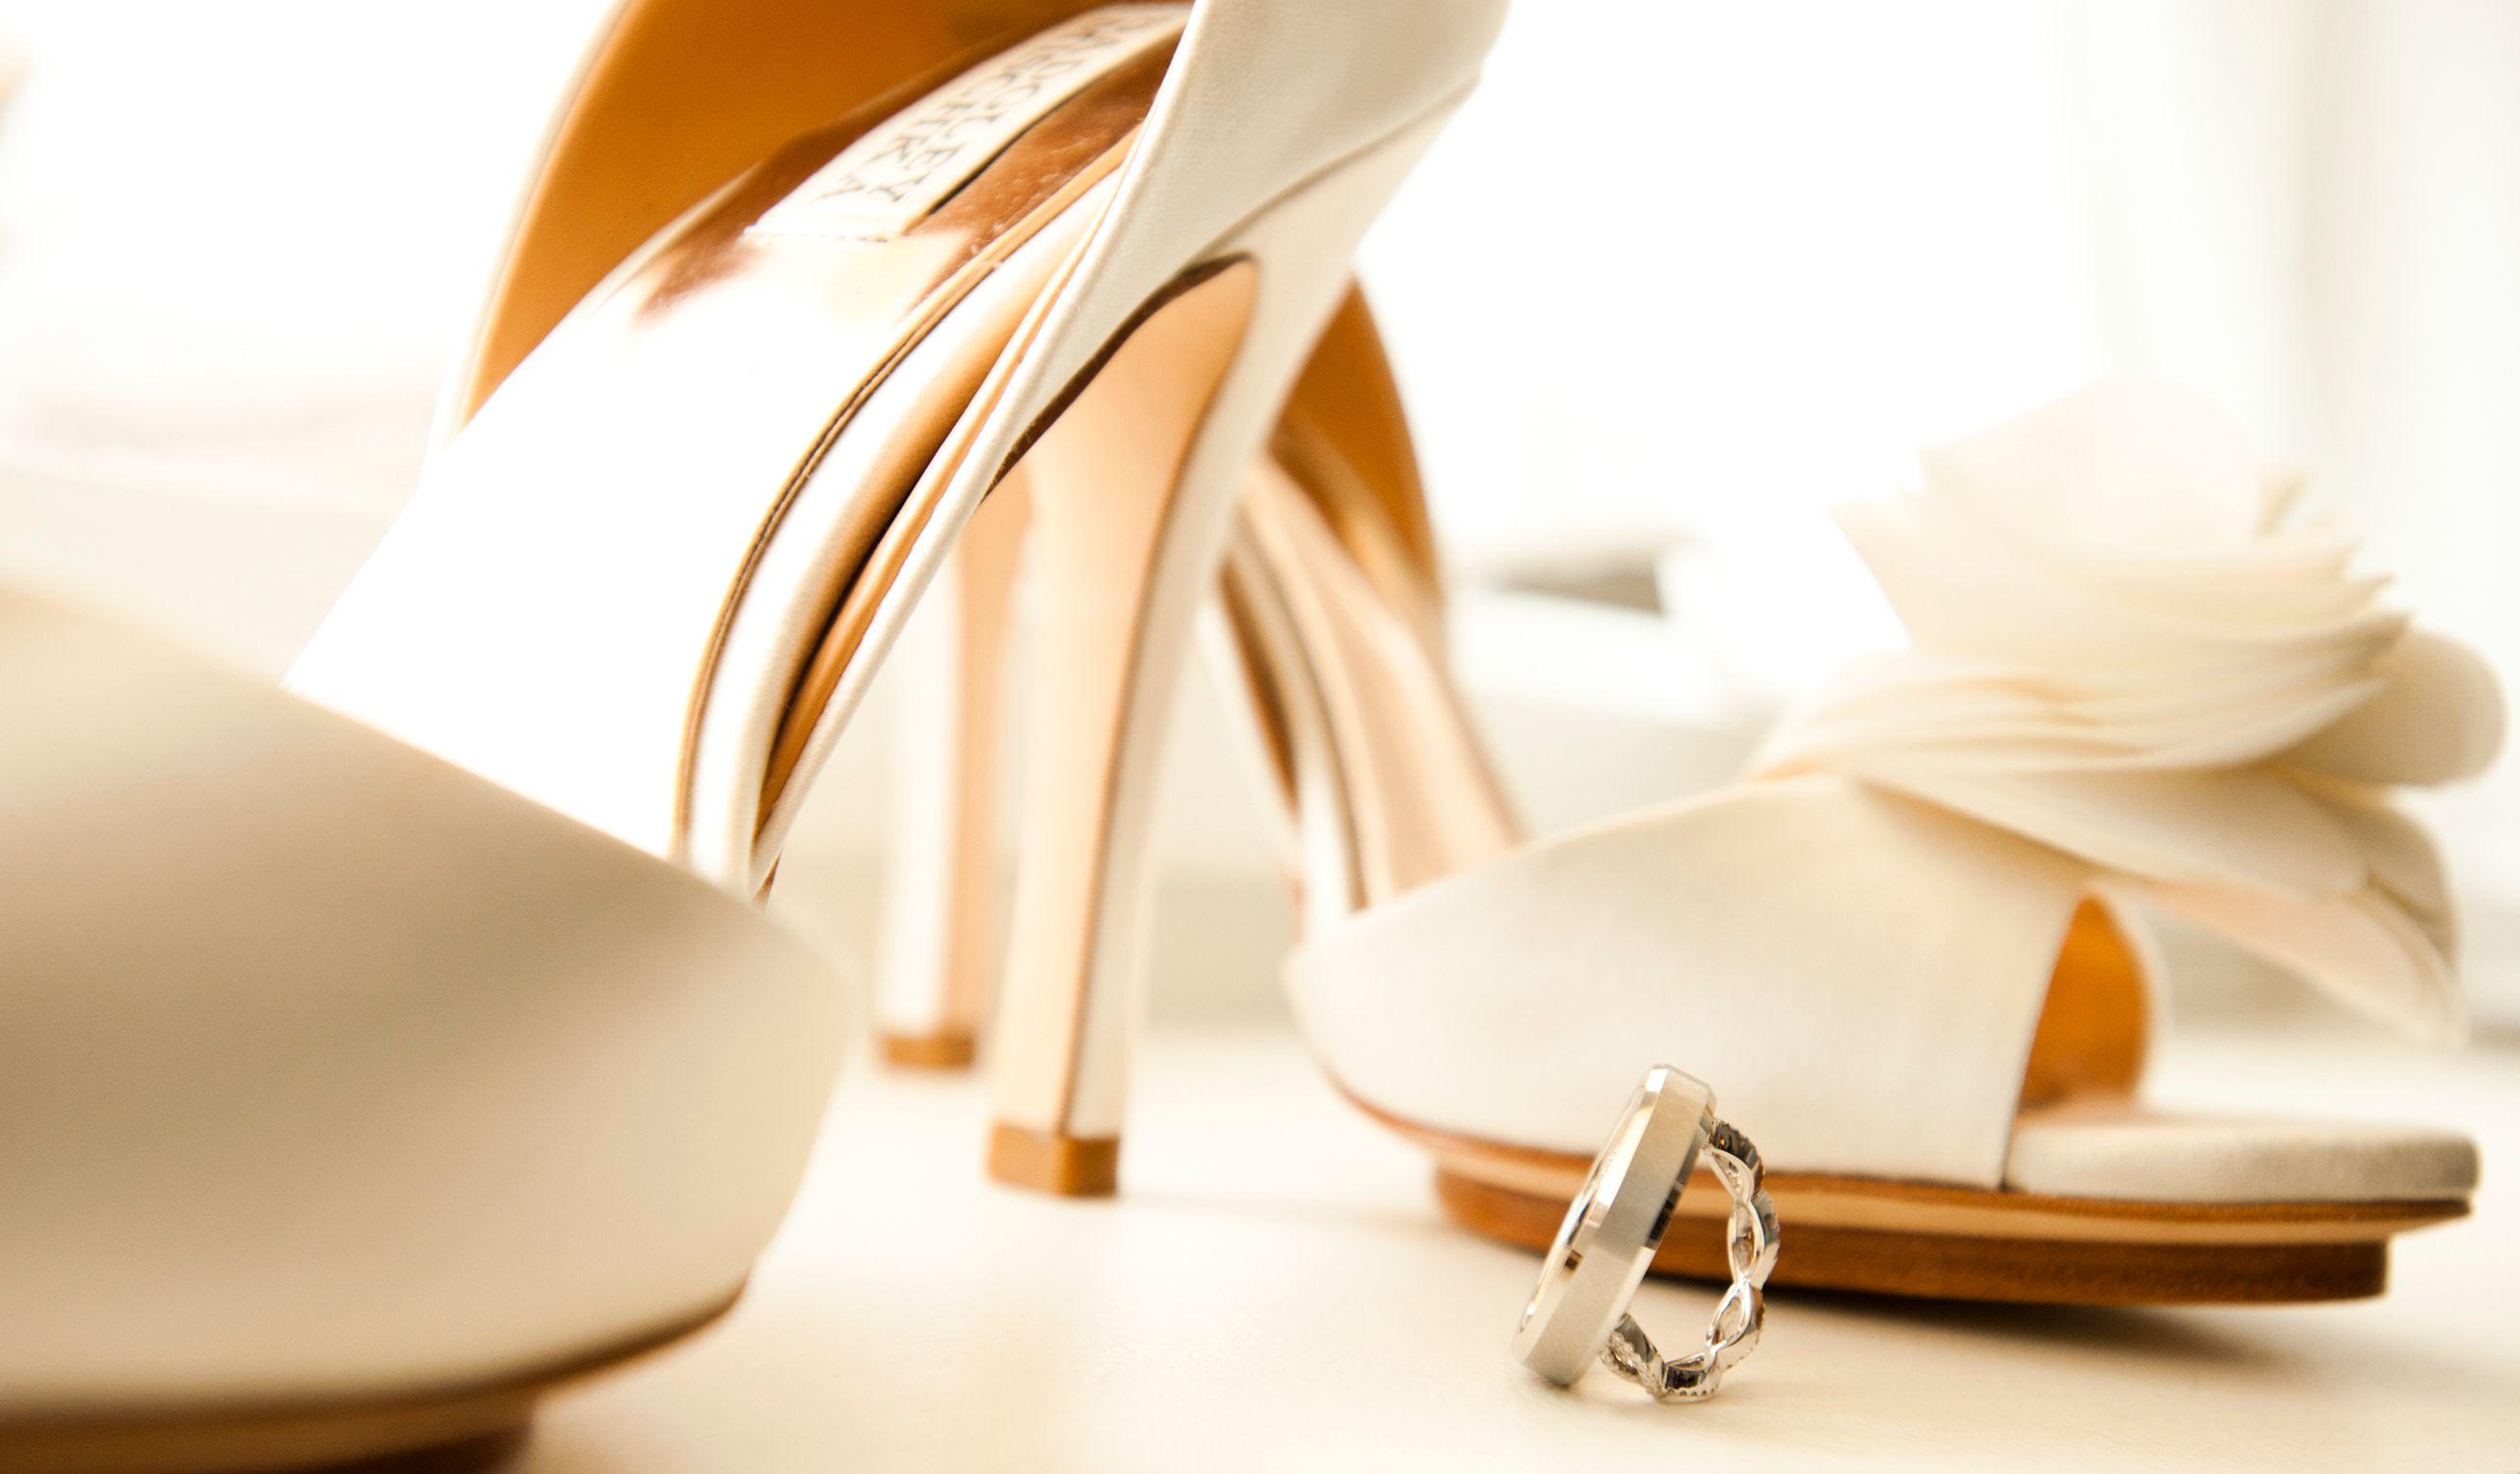 1r20140823_mwpf_megan_and_jordan_s_wedding_perspective_1_7149.jpg